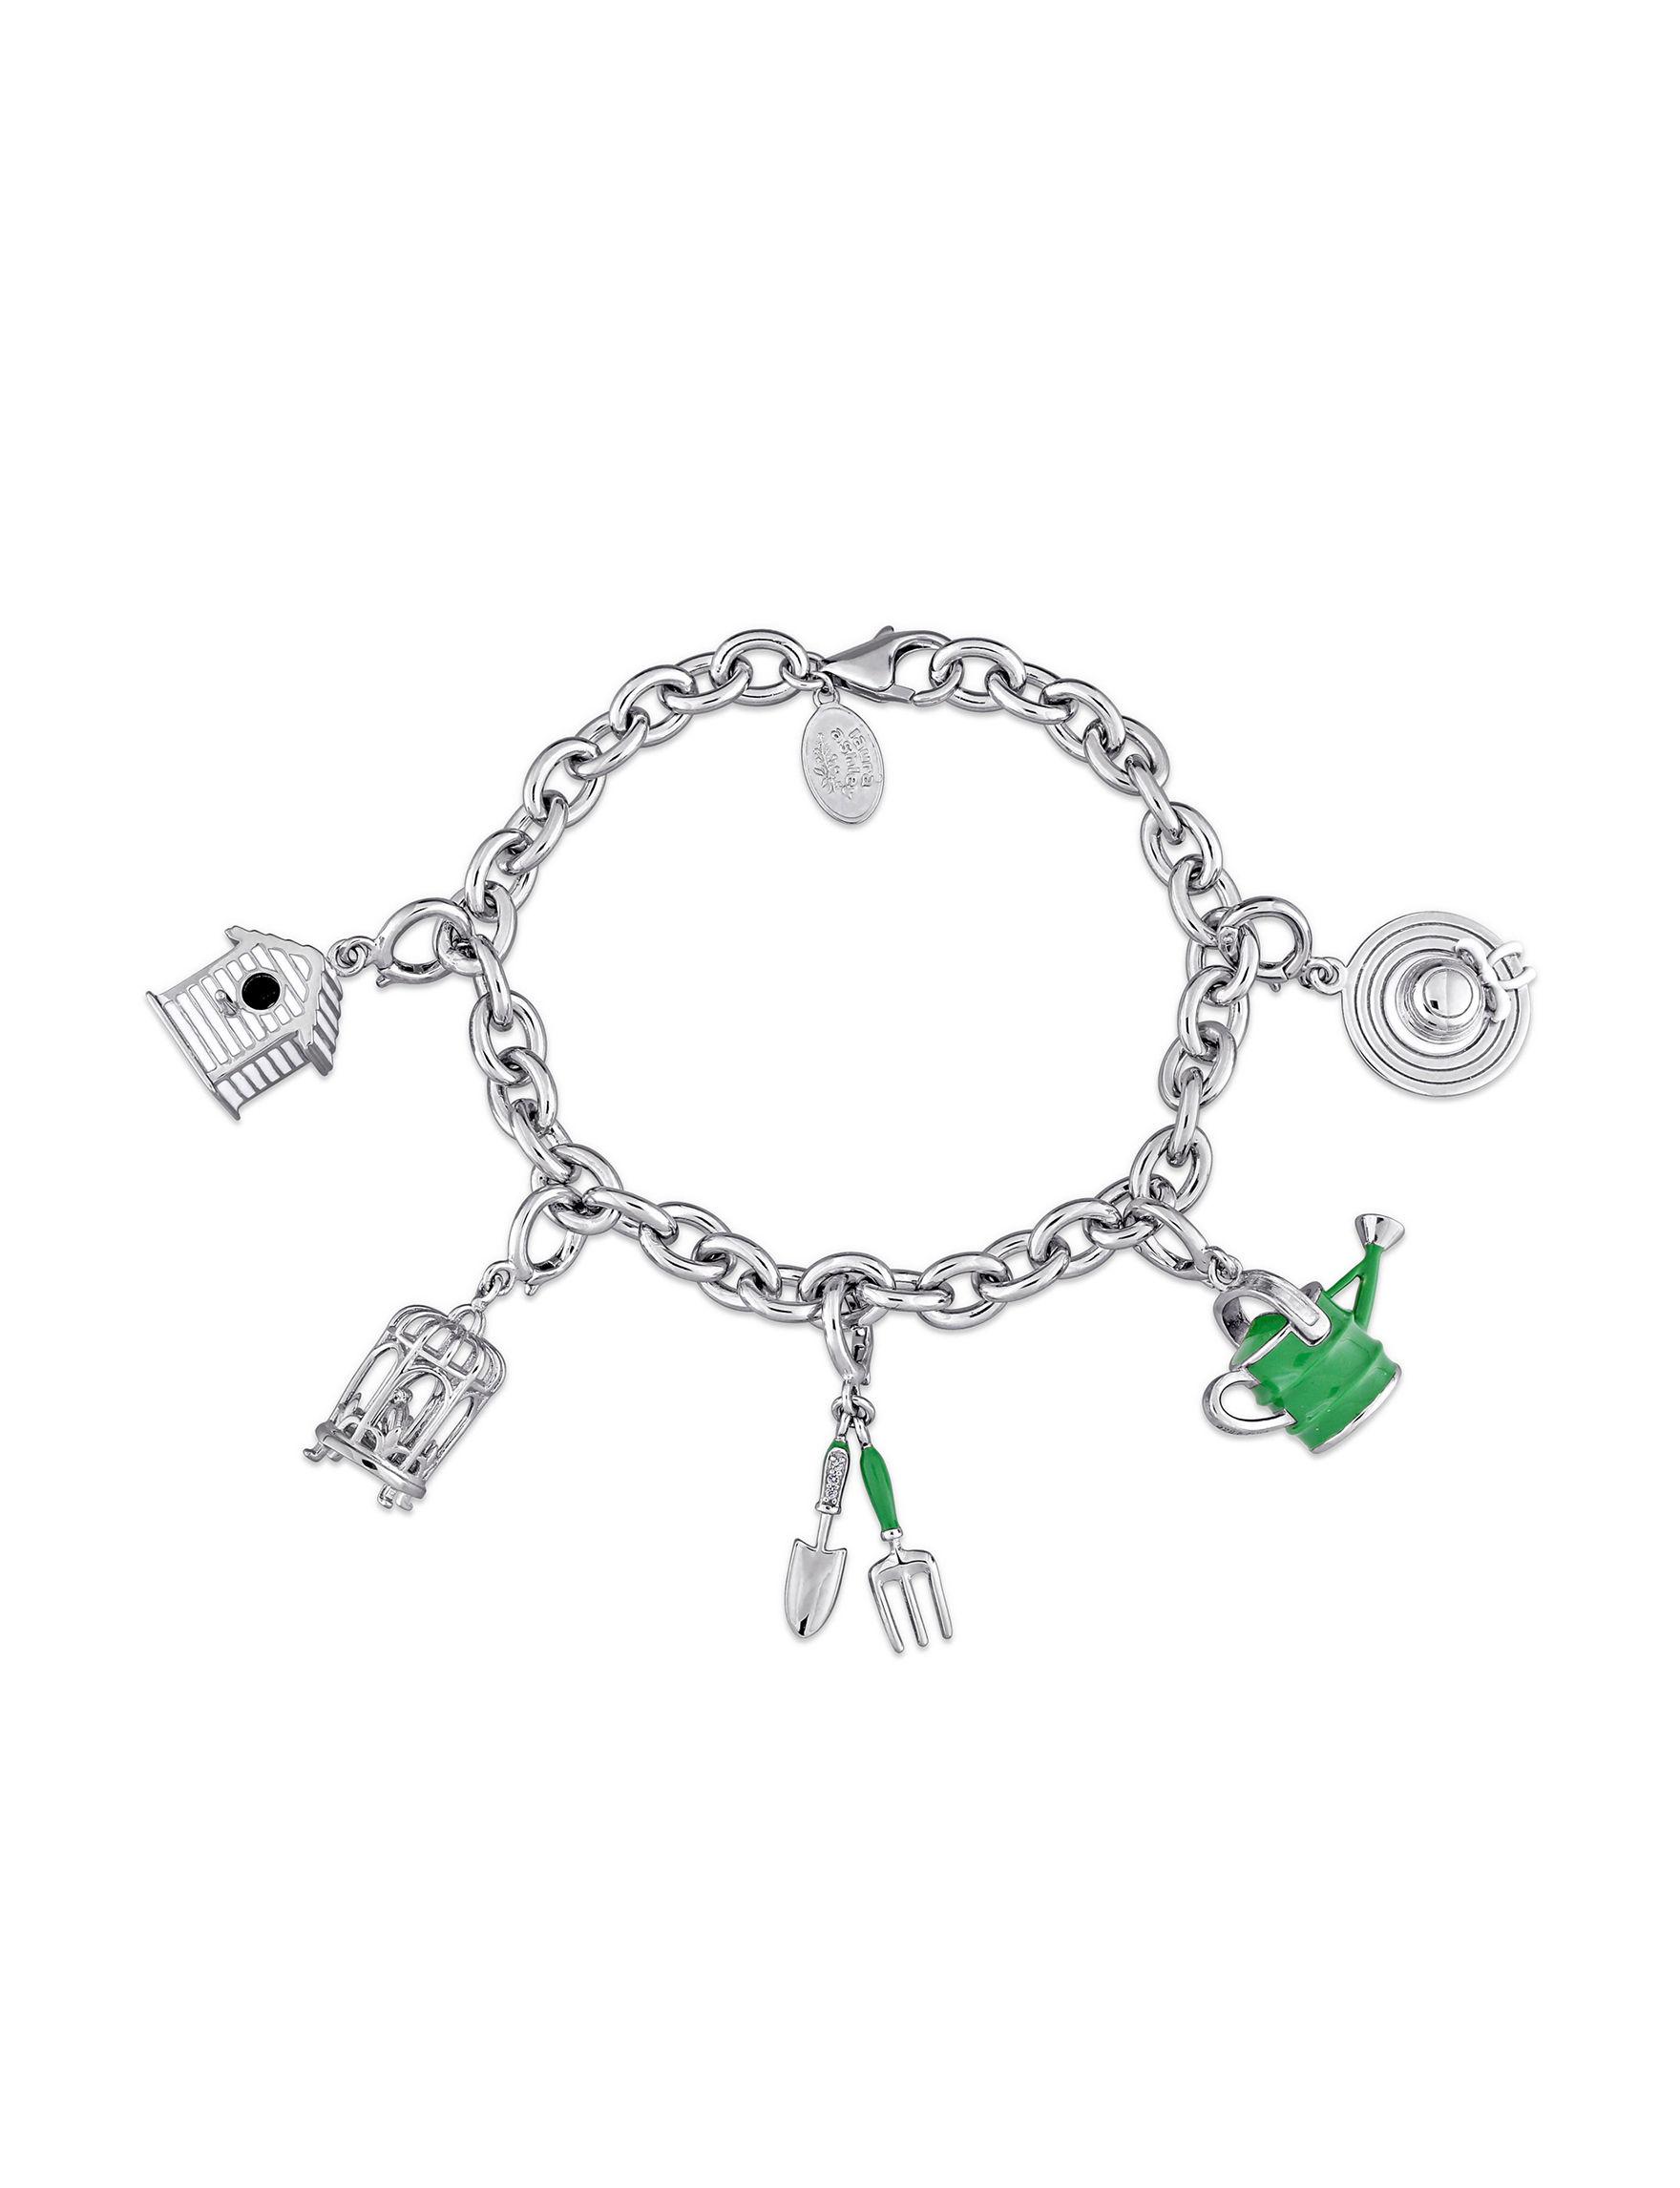 Laura Ashley Silver Bracelets Fine Jewelry